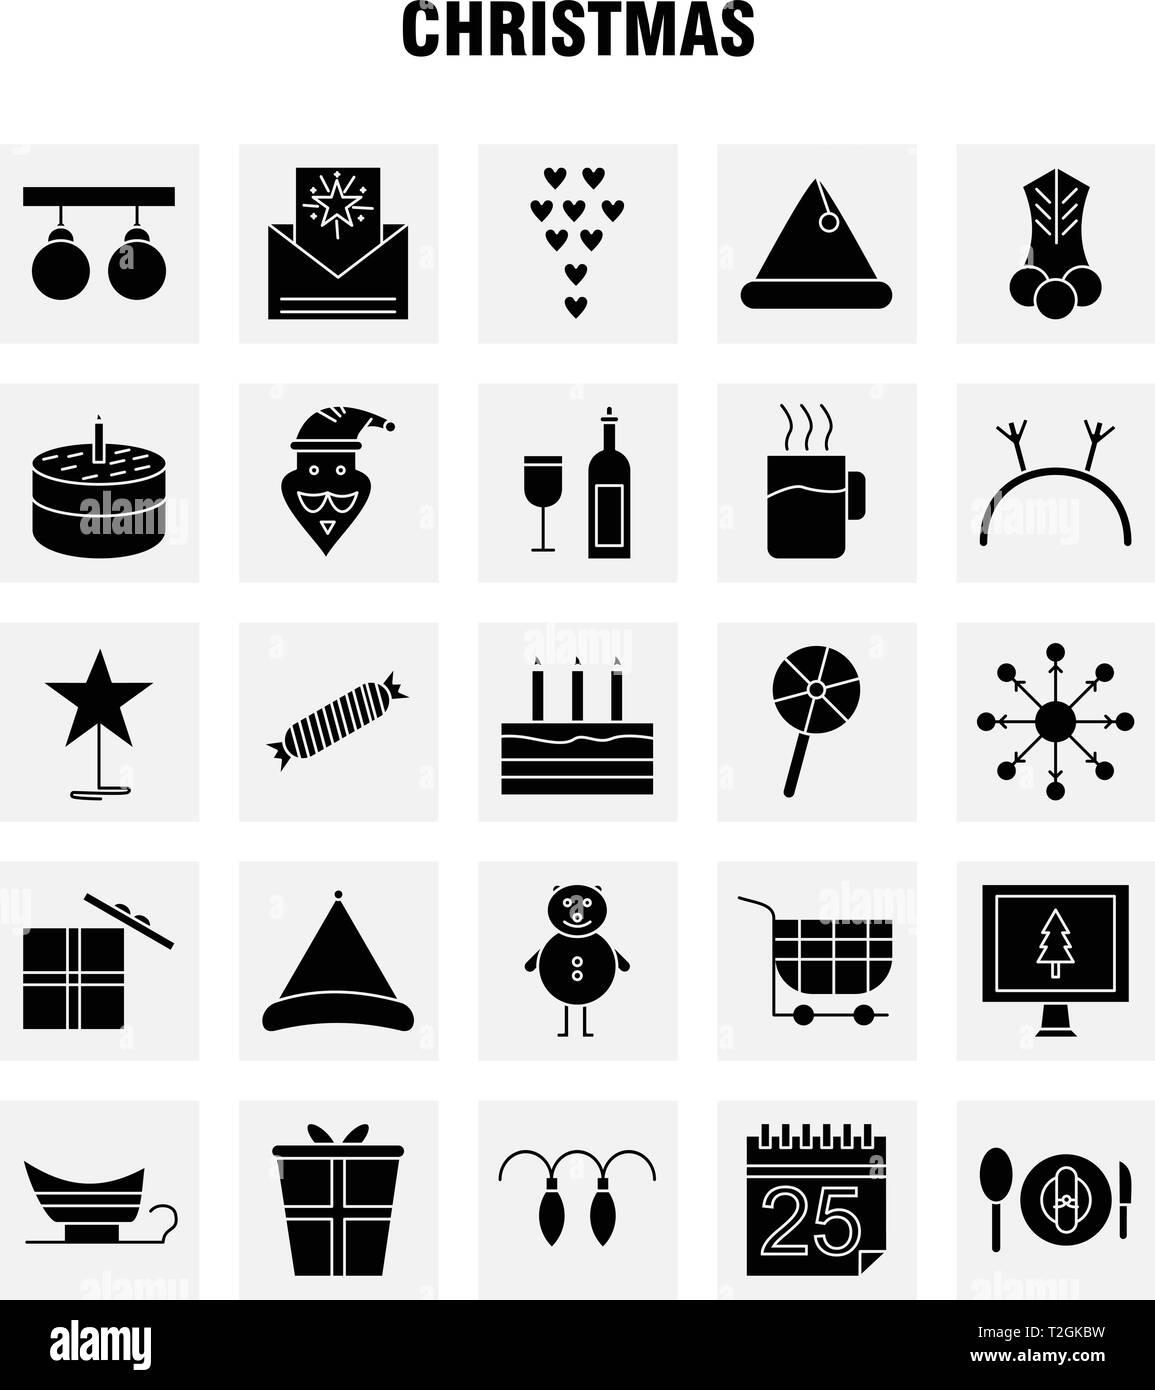 Christmas Solid Glyph Icons Set For Infographics, Mobile UX/UI Kit And Print Design. Include: Christmas Candy, Sweet, Christmas, Food, Meal, Clown, Sa Stock Vector